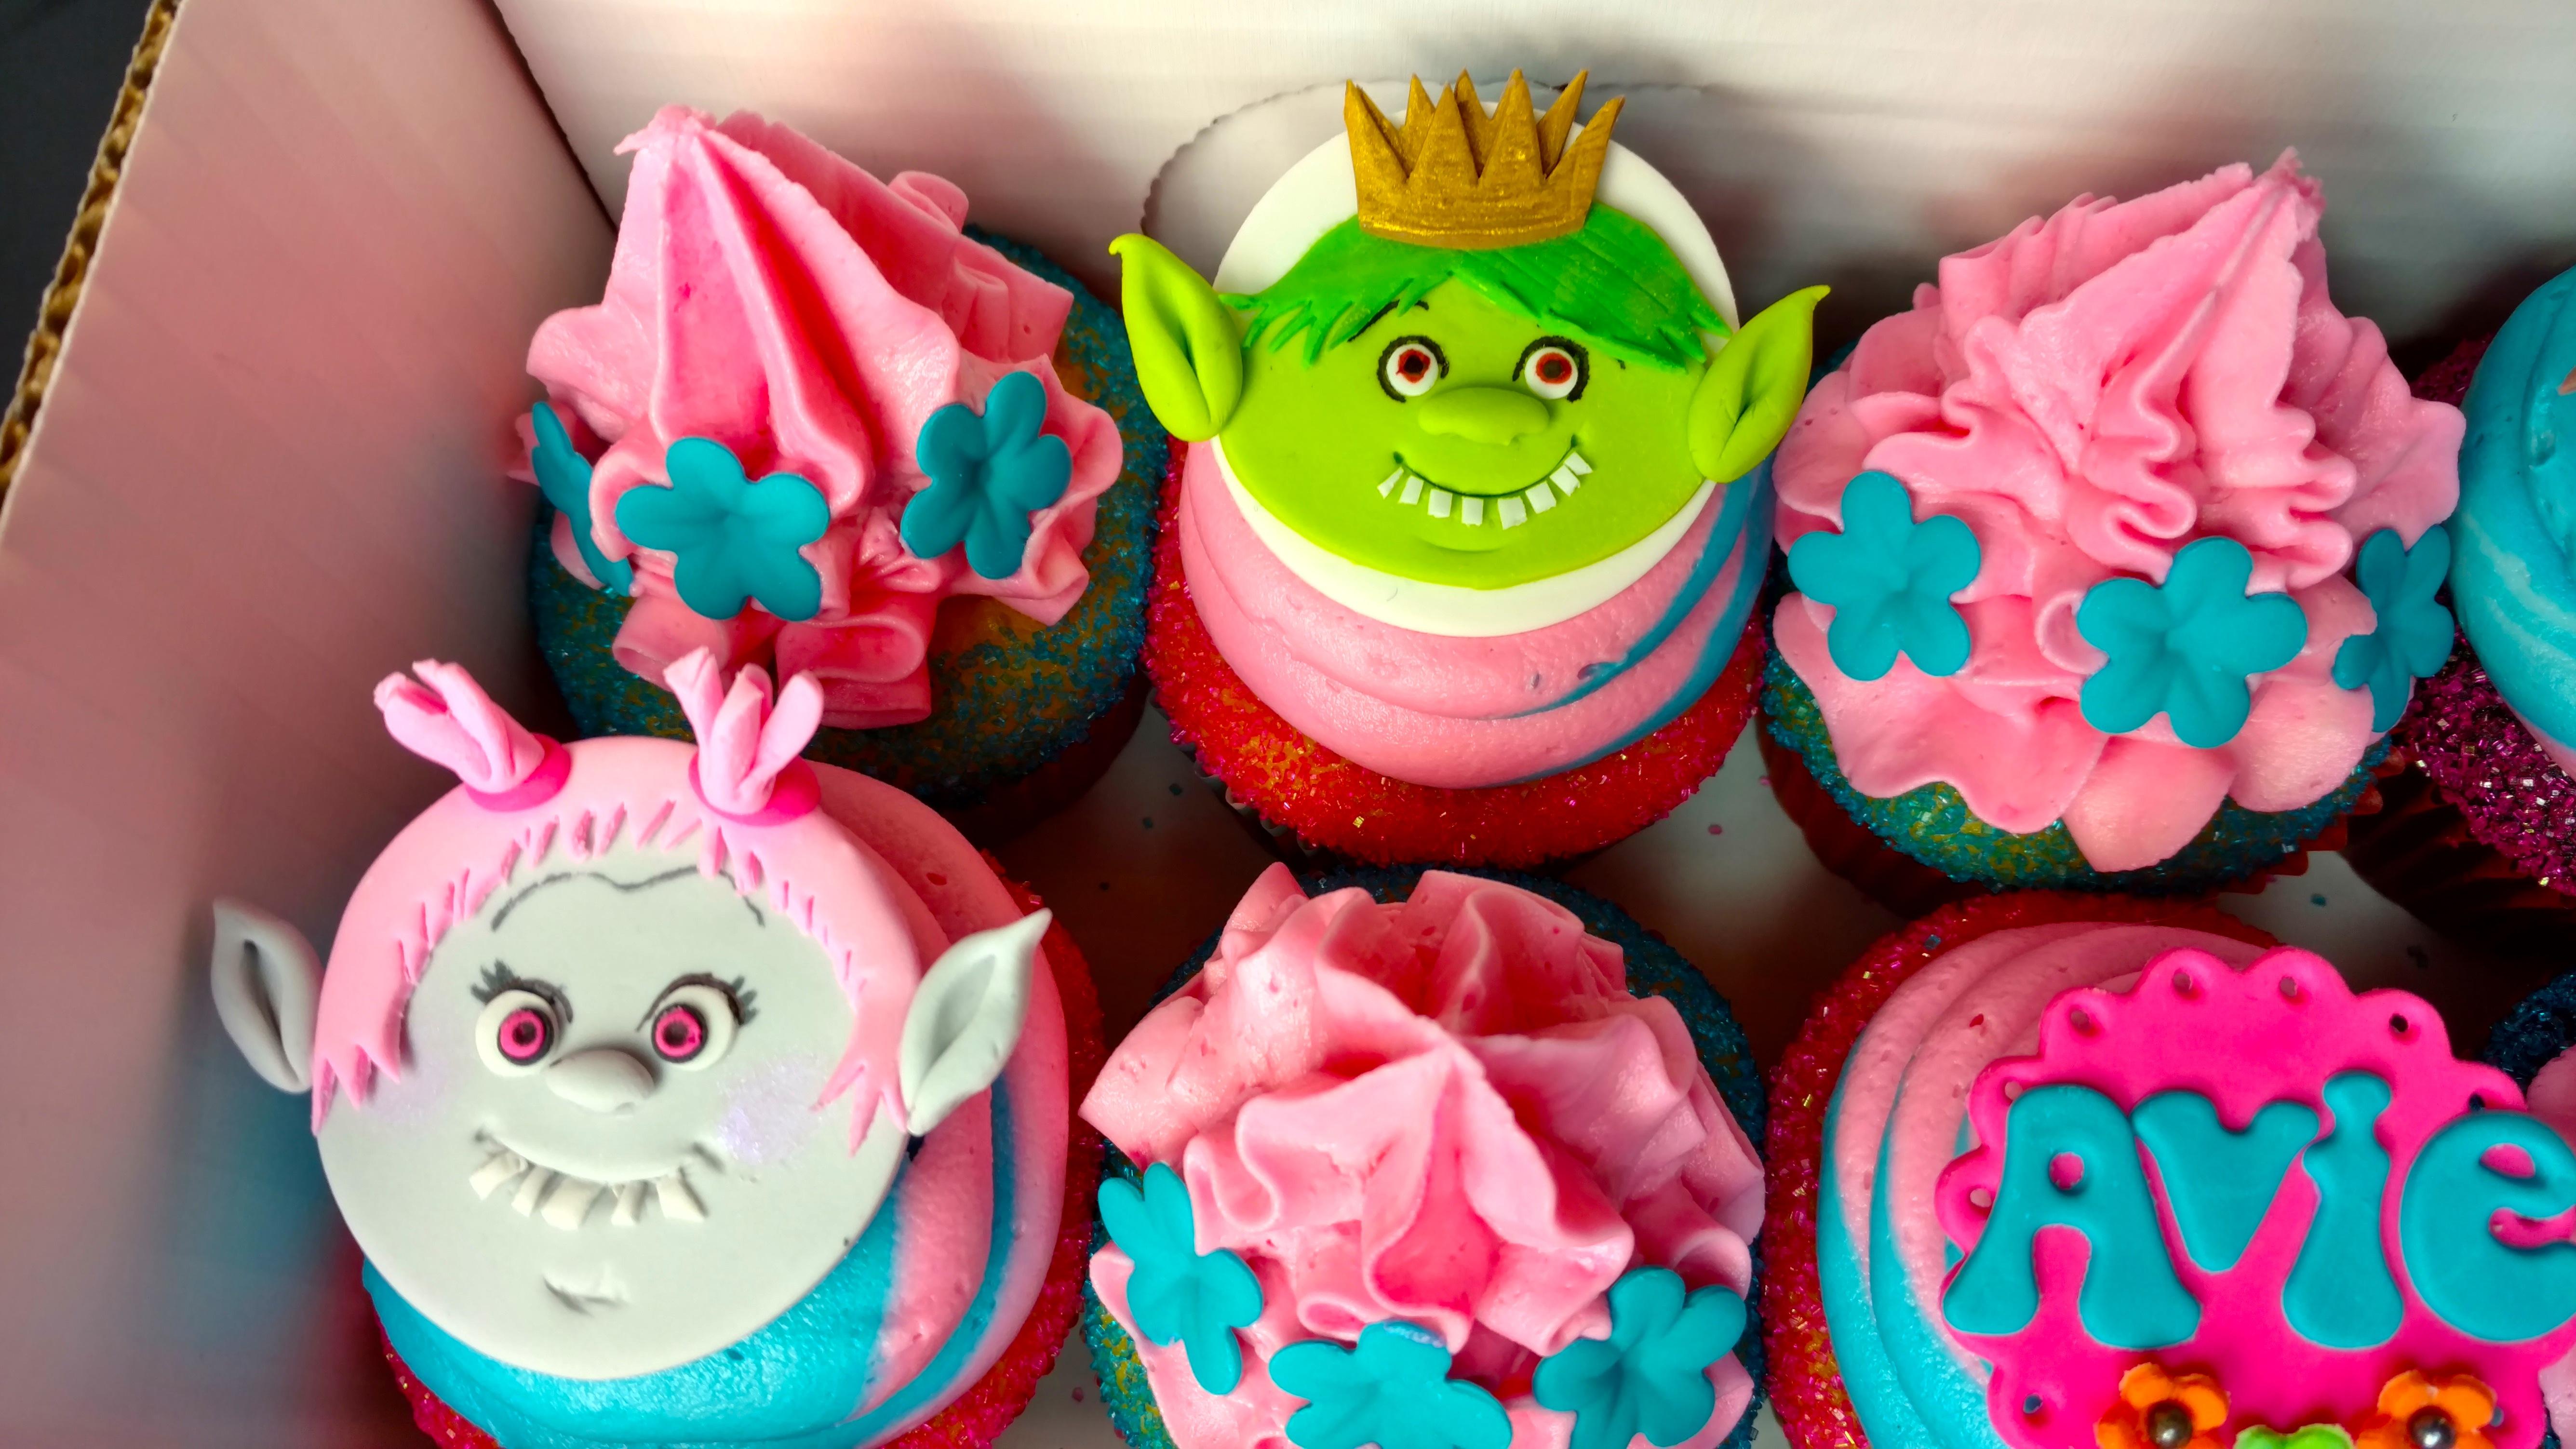 Avie's Trolls Cupcakes